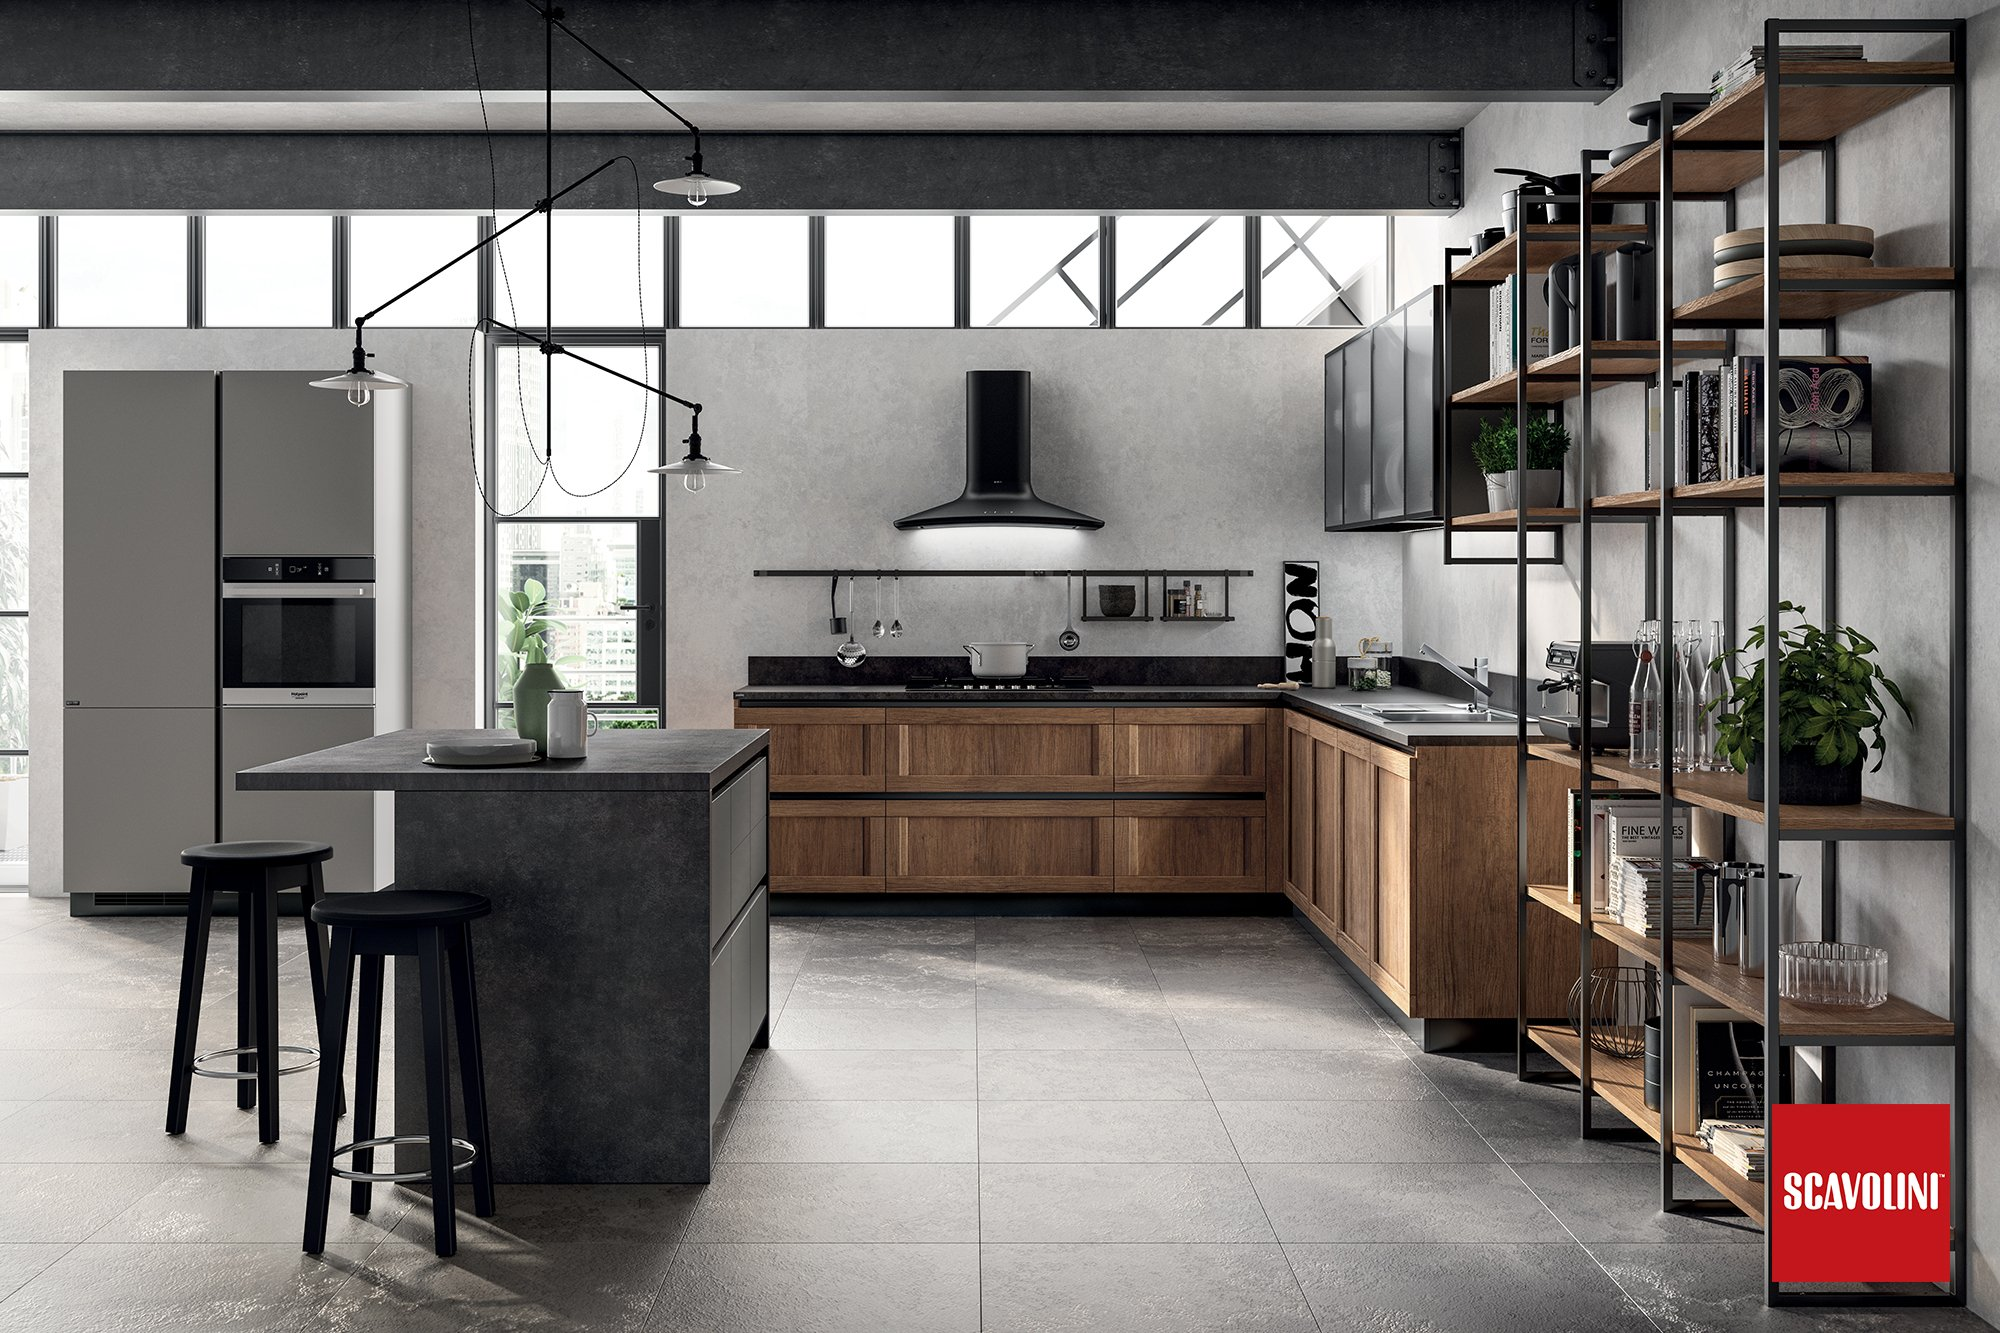 Cucina Scavolini mod. Evolution